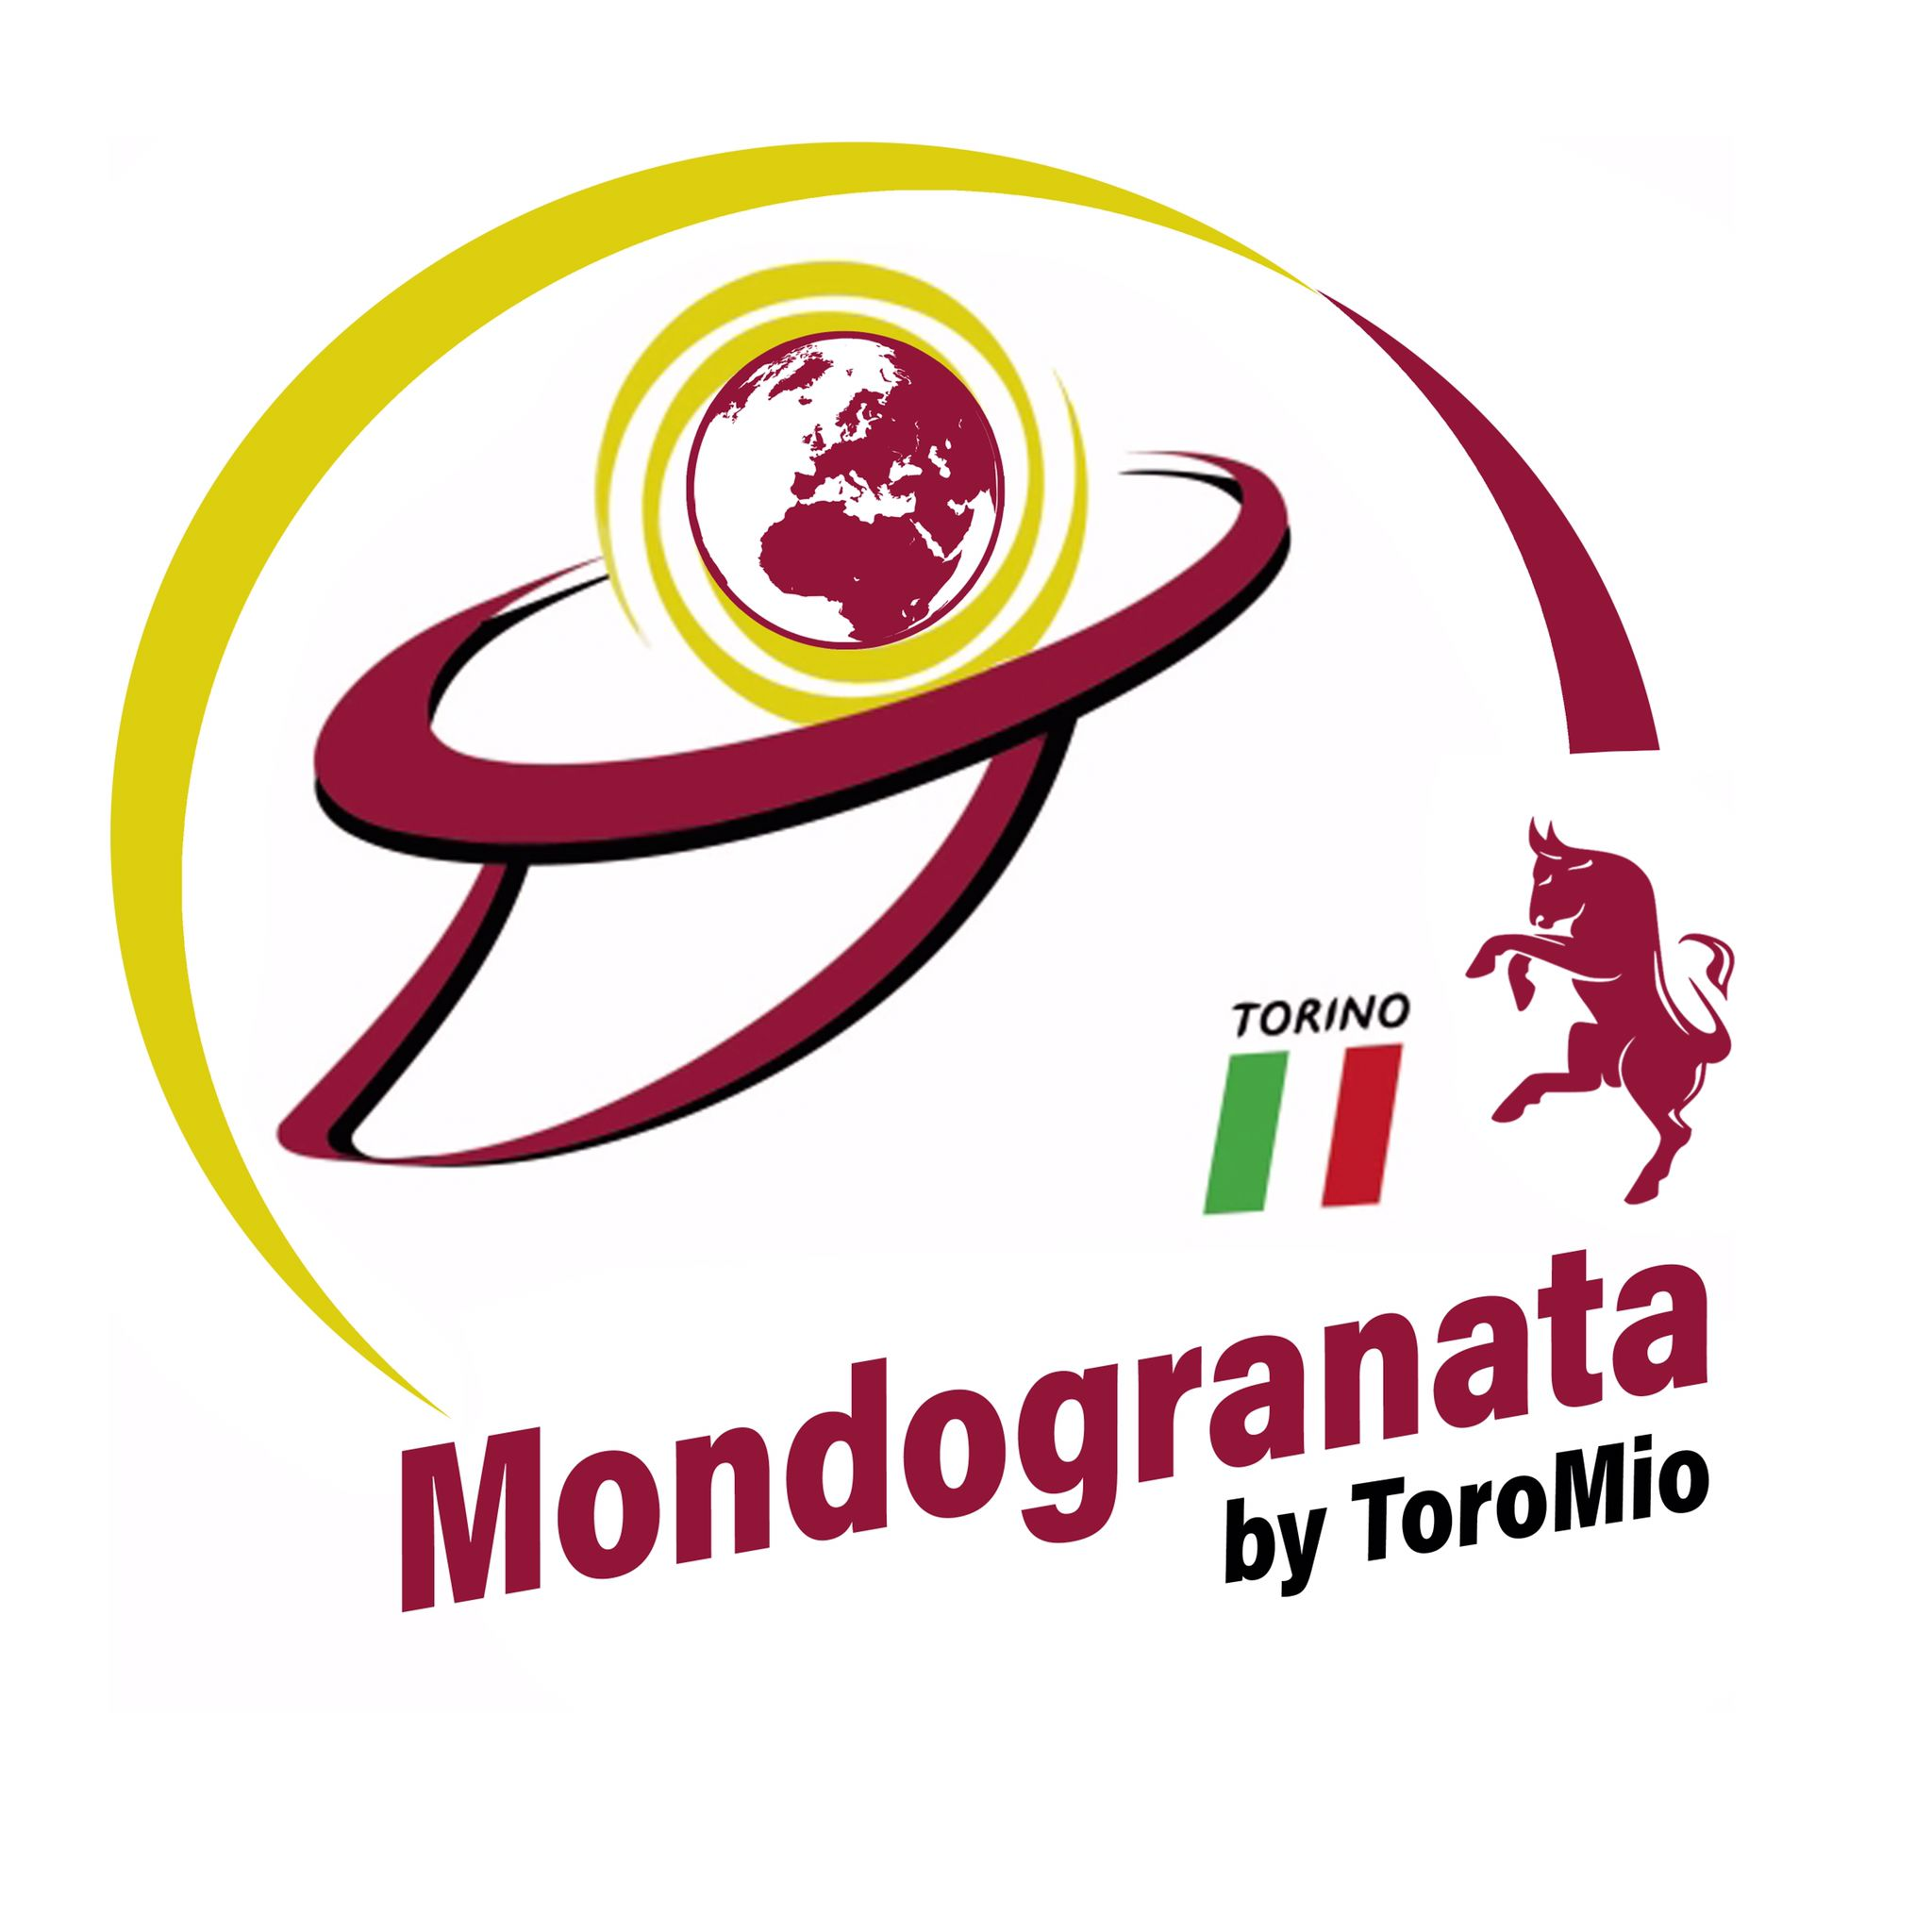 LogoMondogranata